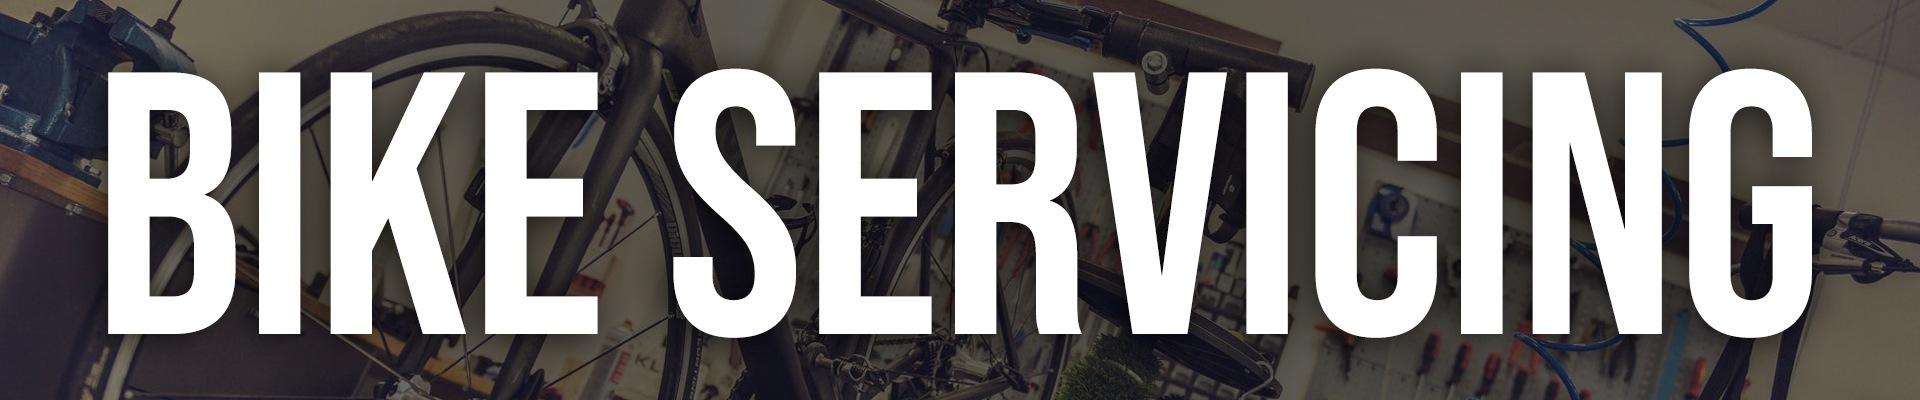 Bike Servicing Banner